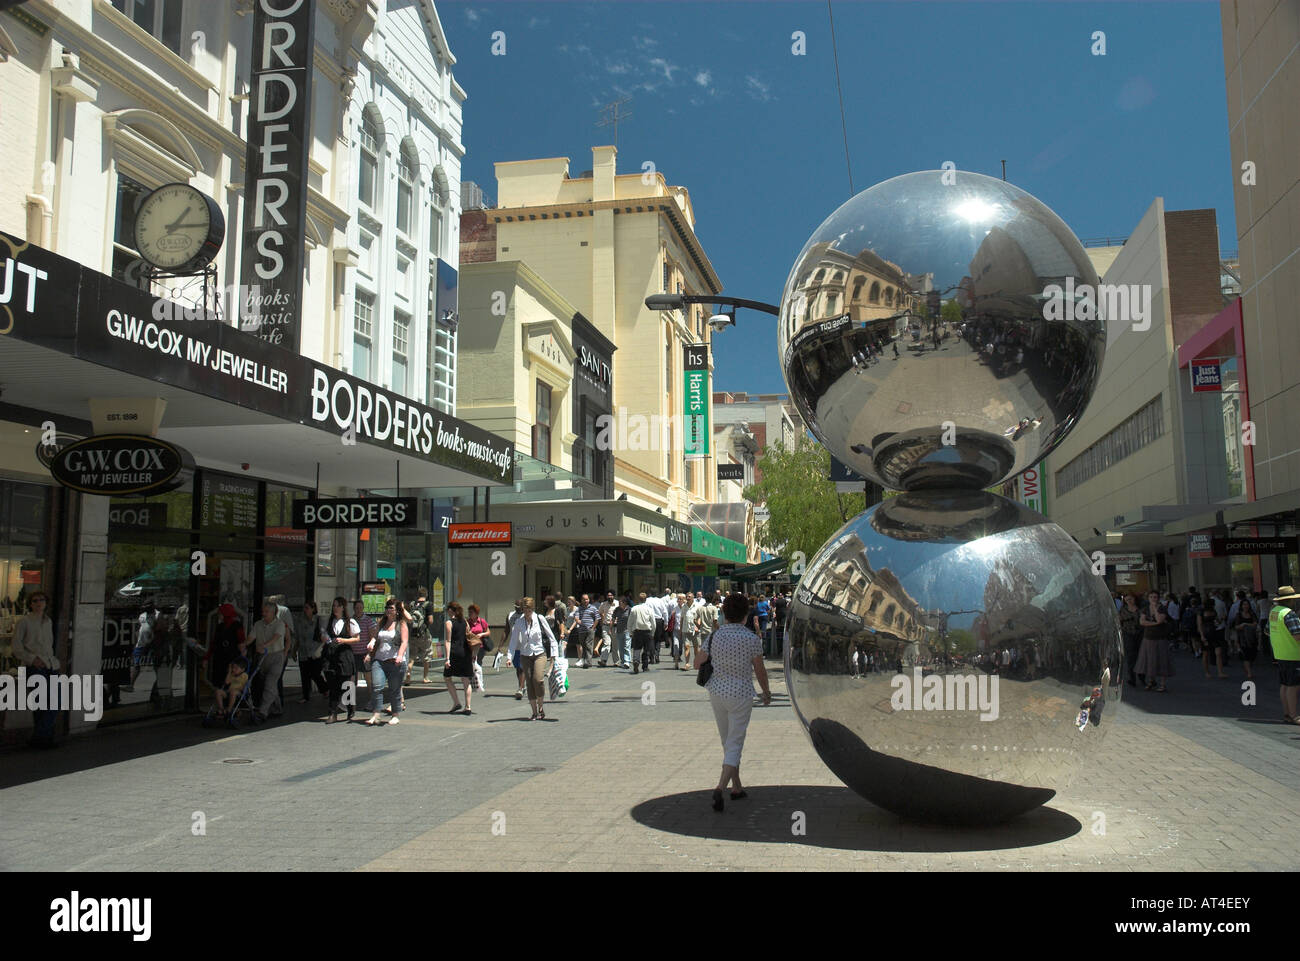 Rundle Mall & Malls Balls, Adelaide, South Australia - Stock Image